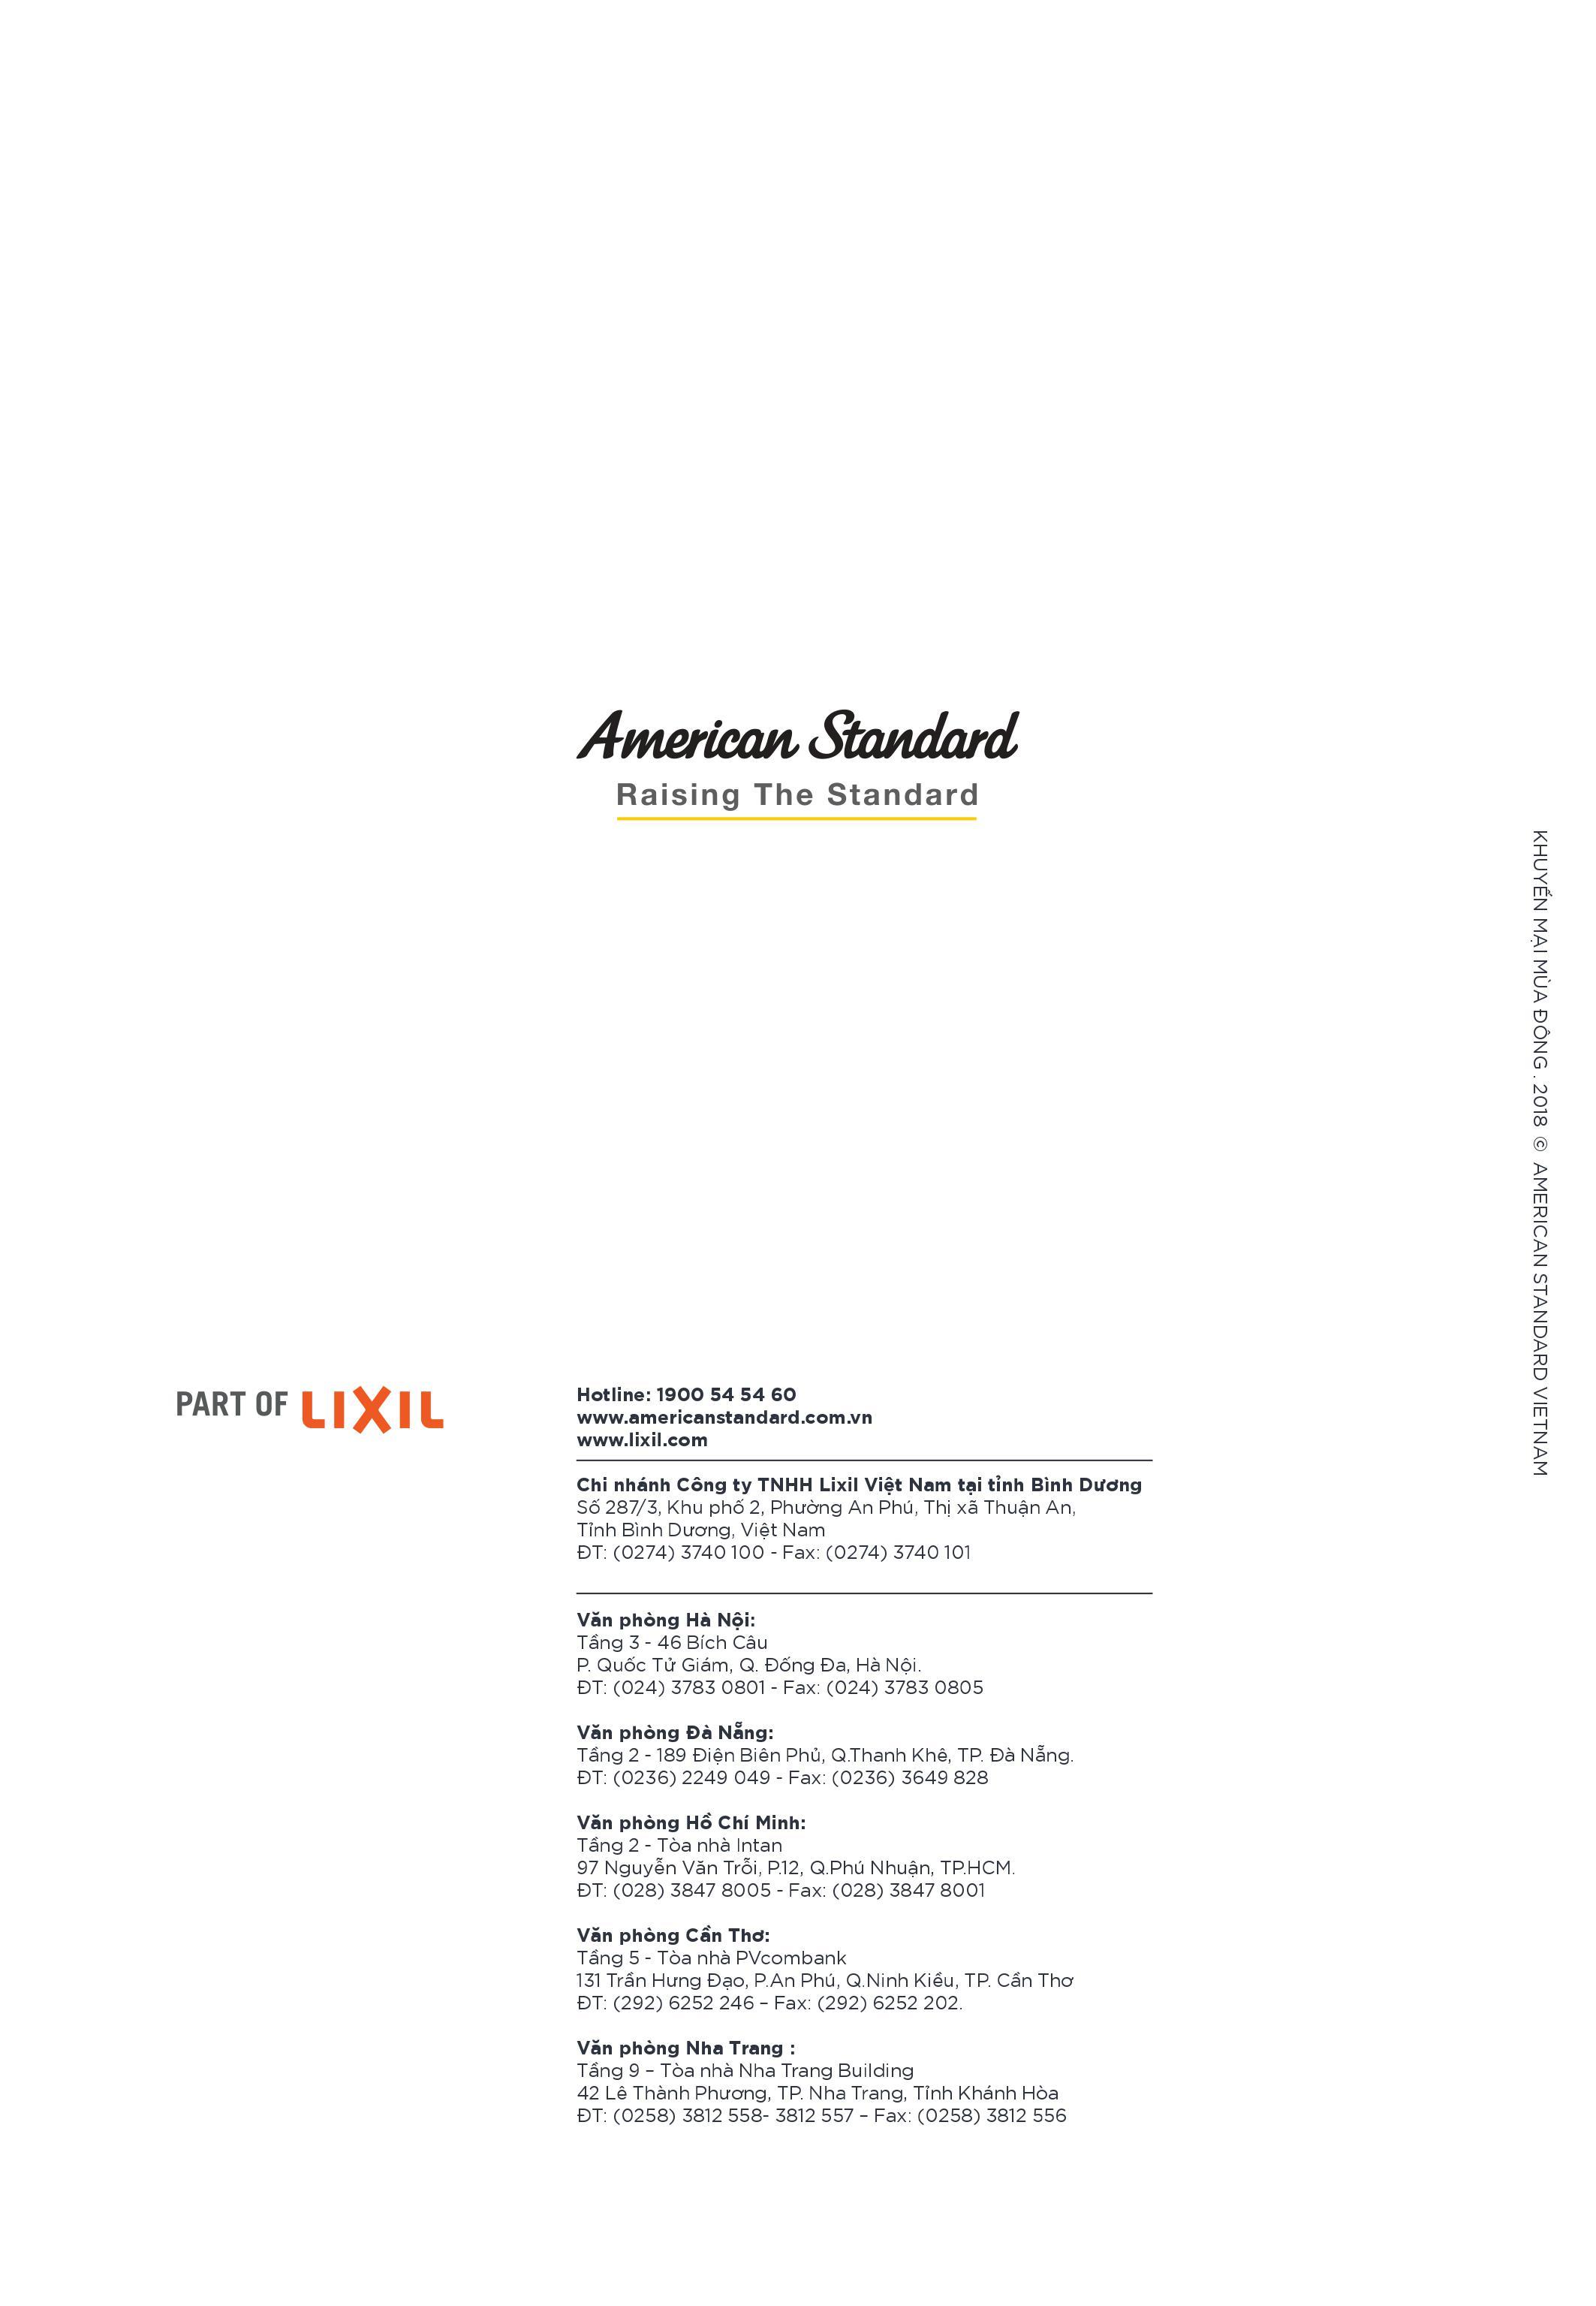 khuyen-mai-mua-dong-2018-american-standard